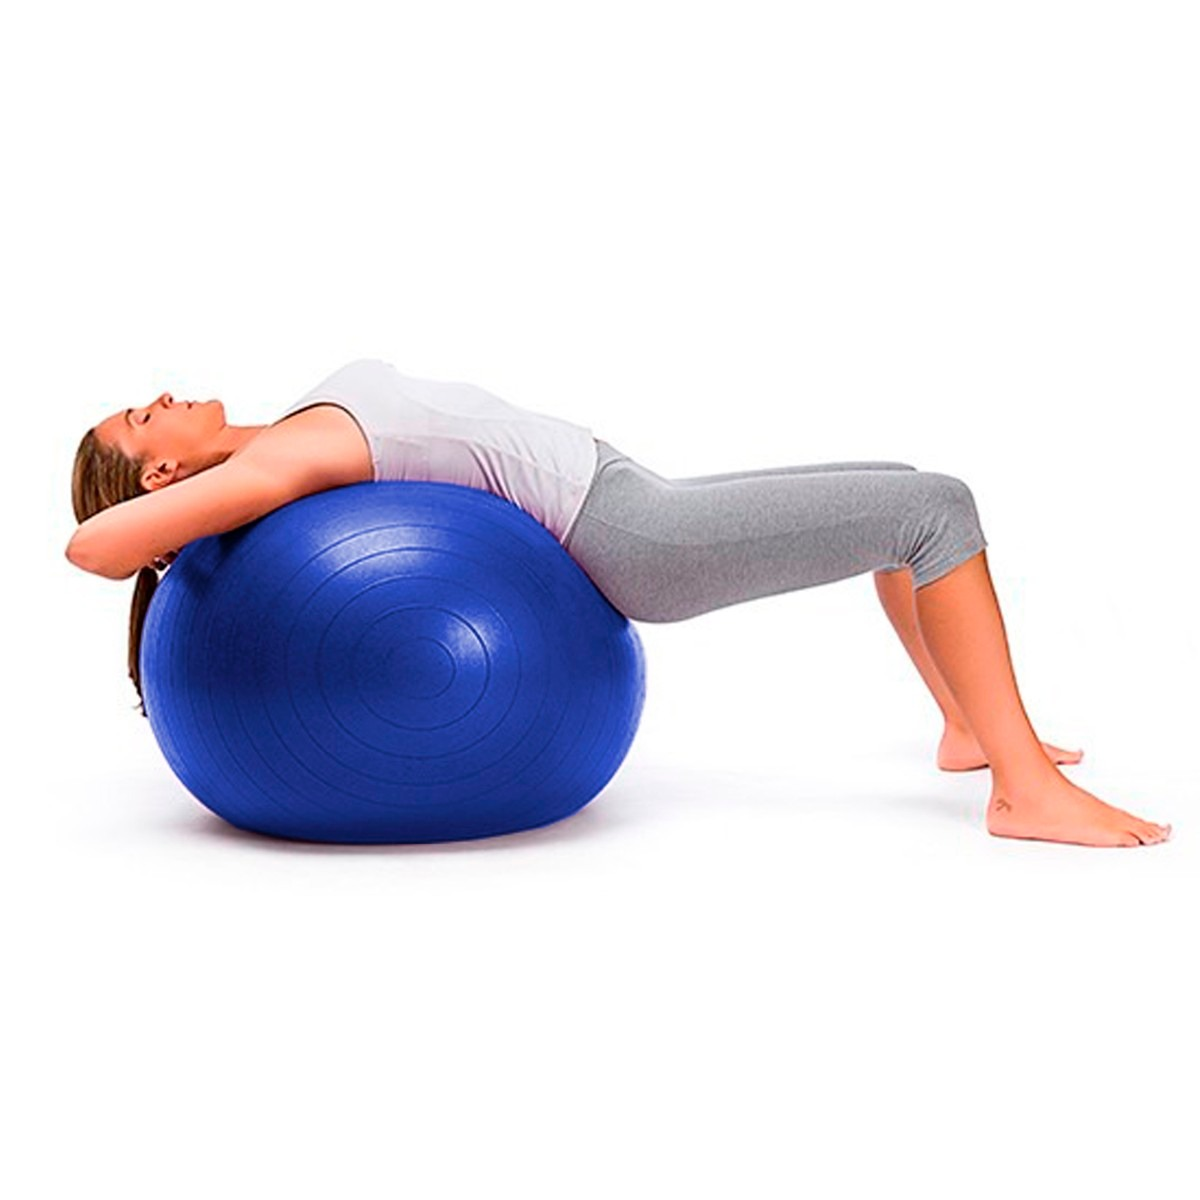 balon terapeutico 75 cm pinches pelota rehabilitacion estim. Cargando zoom. 4b15a25dba5c